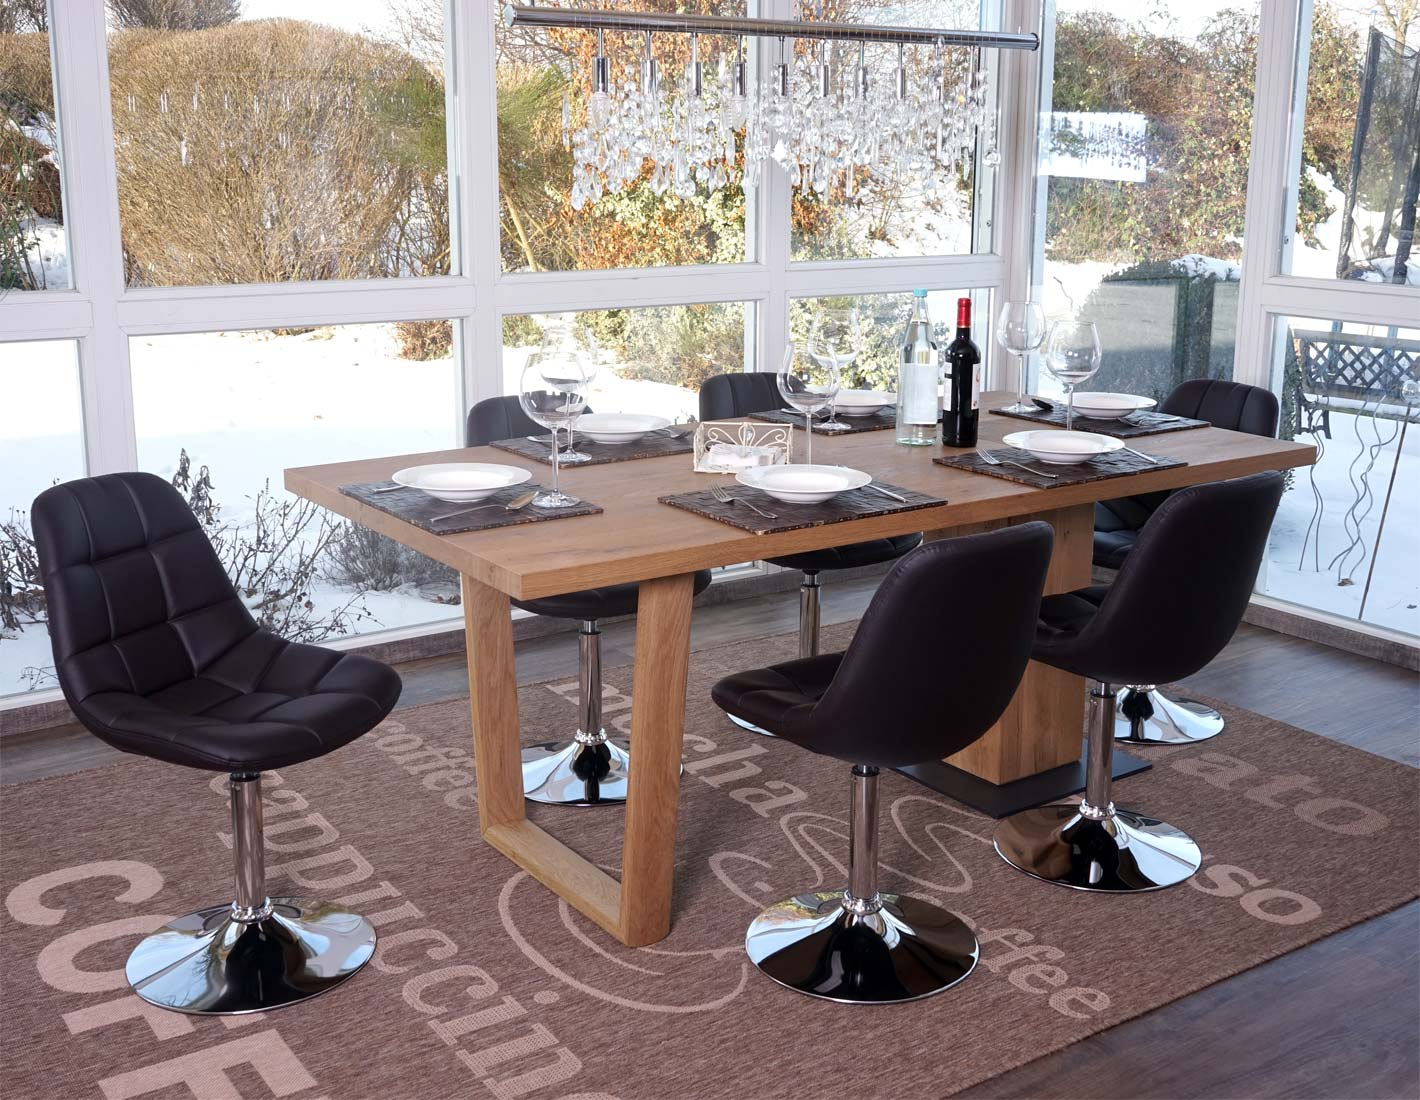 6x esszimmerstuhl pontedera stuhl drehstuhl chrom kunstleder braun ebay. Black Bedroom Furniture Sets. Home Design Ideas